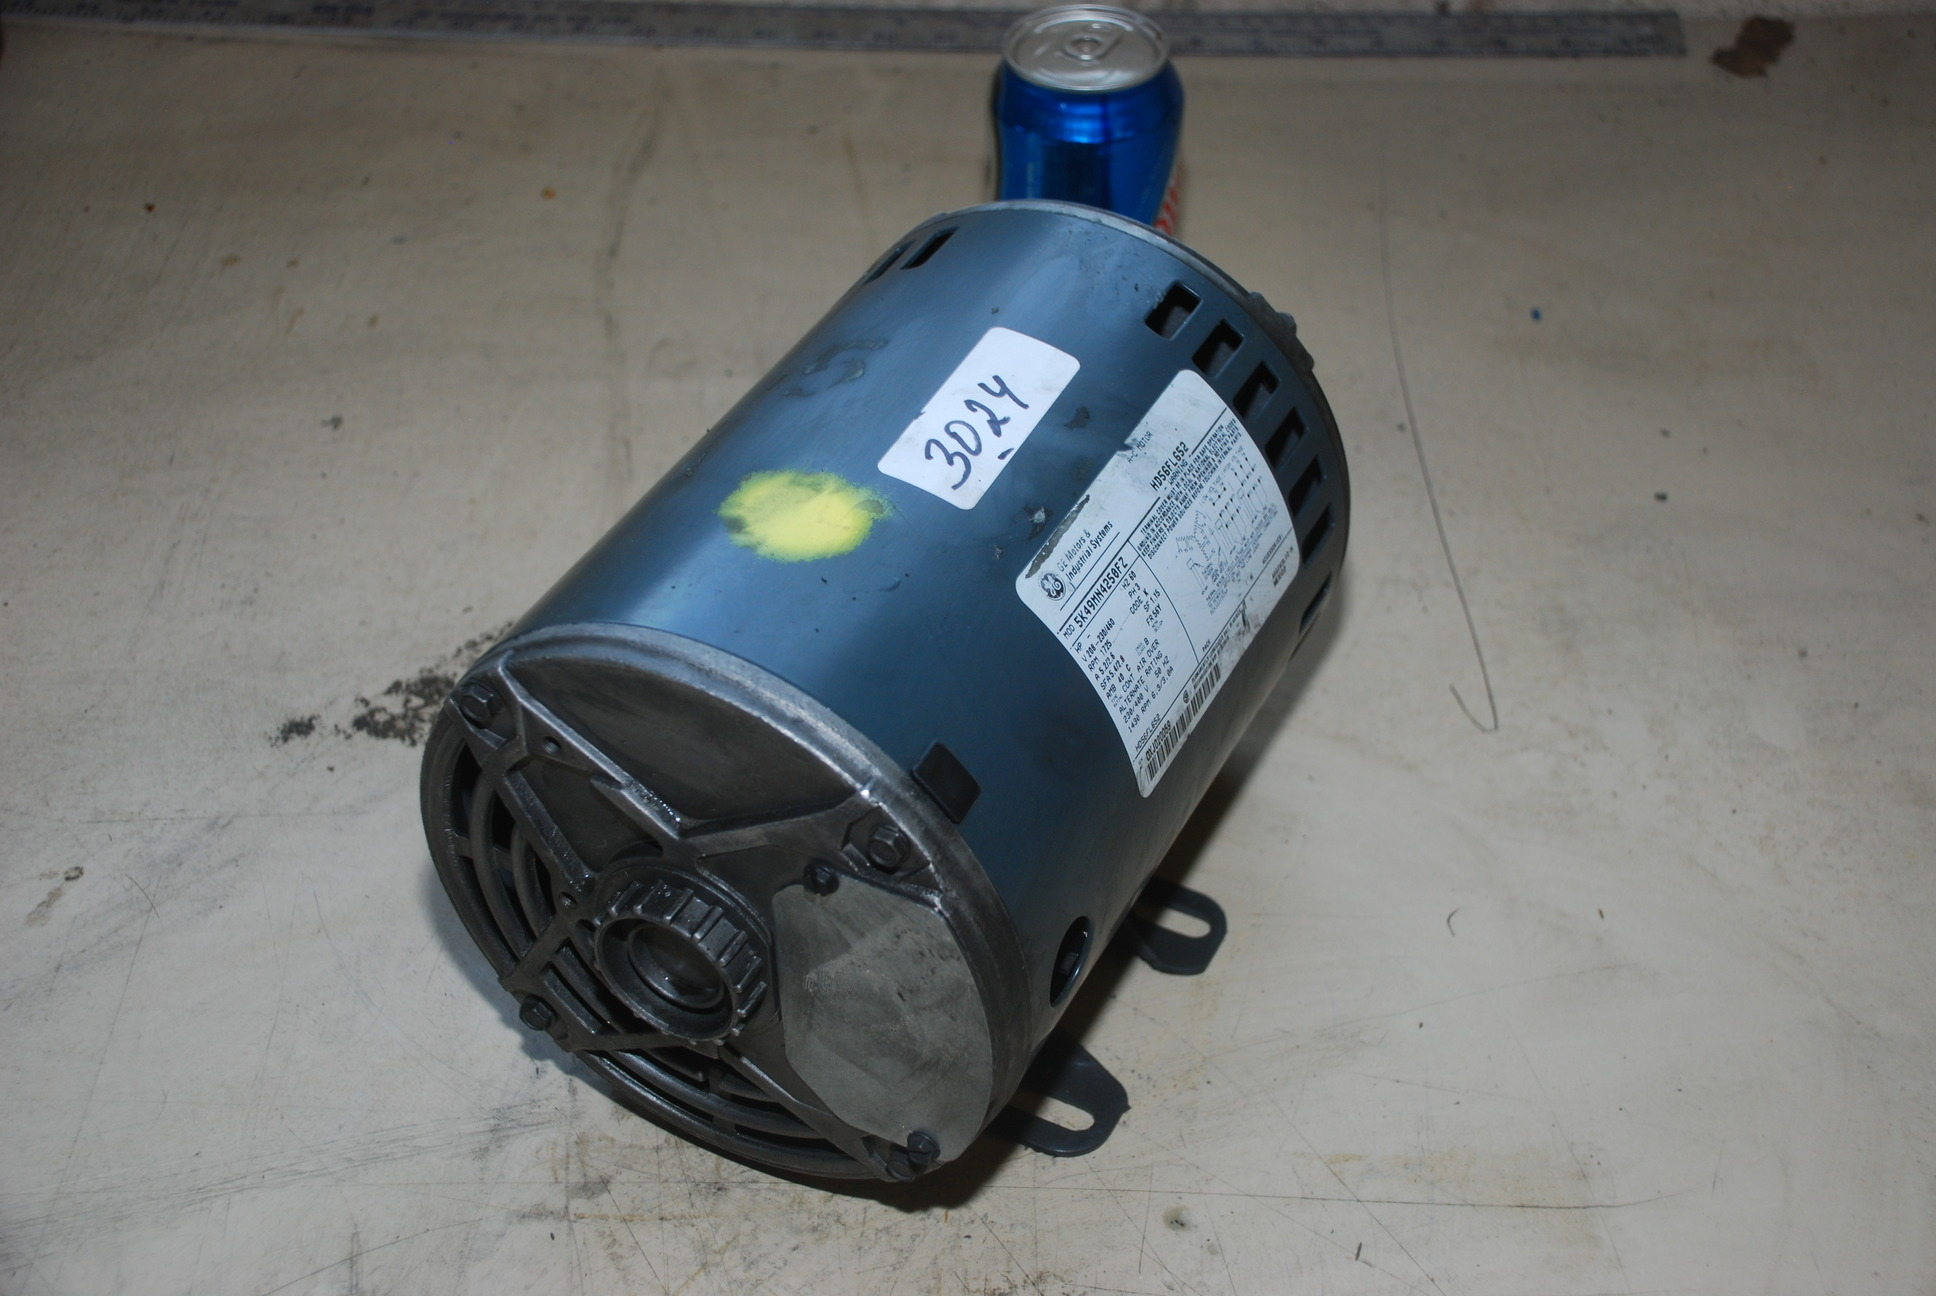 GE HVAC Blower Fan Motors as well Ao Smith 1 HP Blower Motor furthermore HVAC Blower Motor further GE 1 2 HP Furnace Blower Motor Replacement additionally Furnace Blower Fan Motor. on furnace fan motor